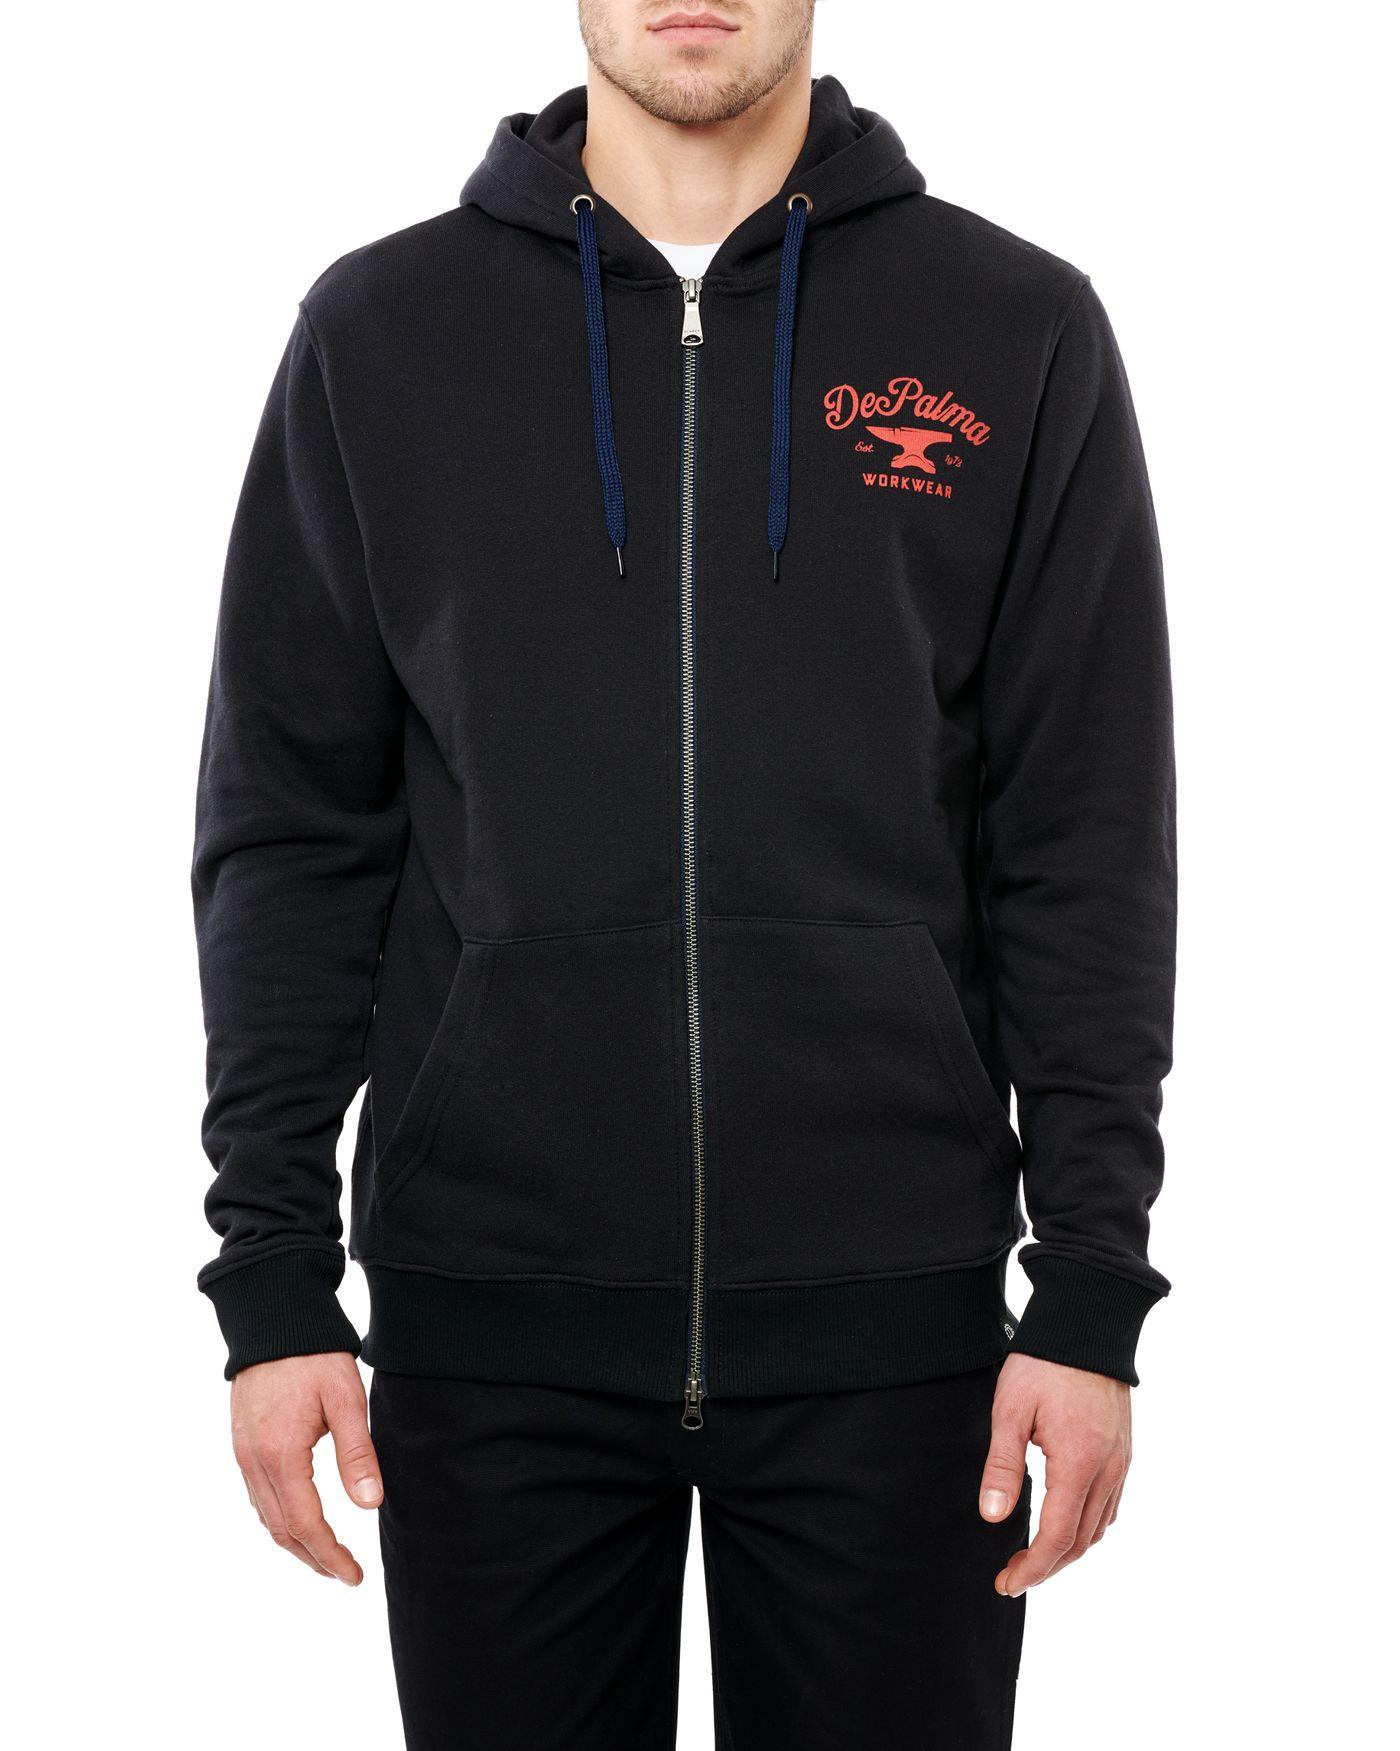 Photo of Anvil Zip Hooded Sweatshirt, Navy